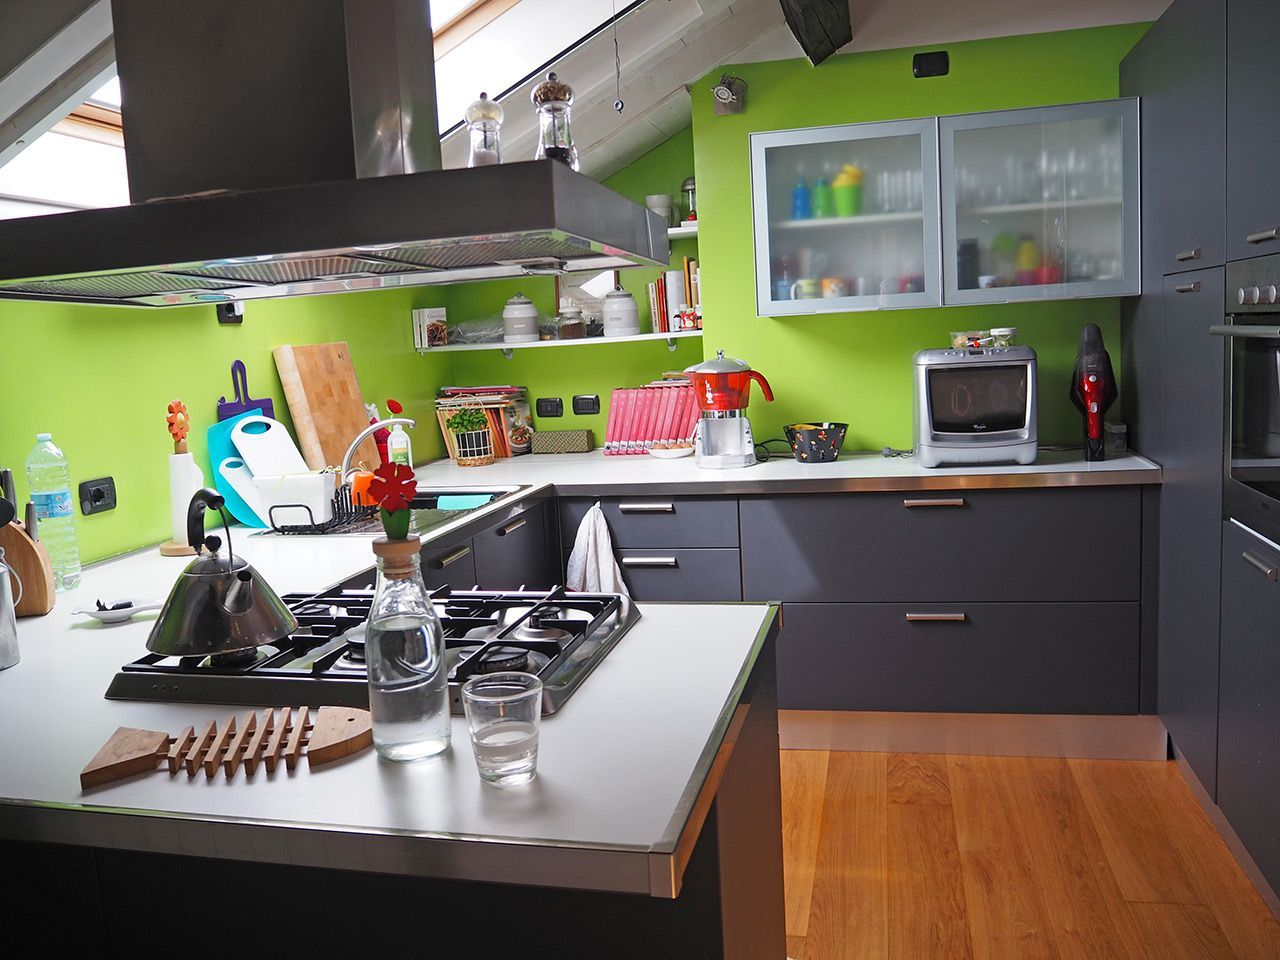 Three-room apartment in Verbania - kitchen